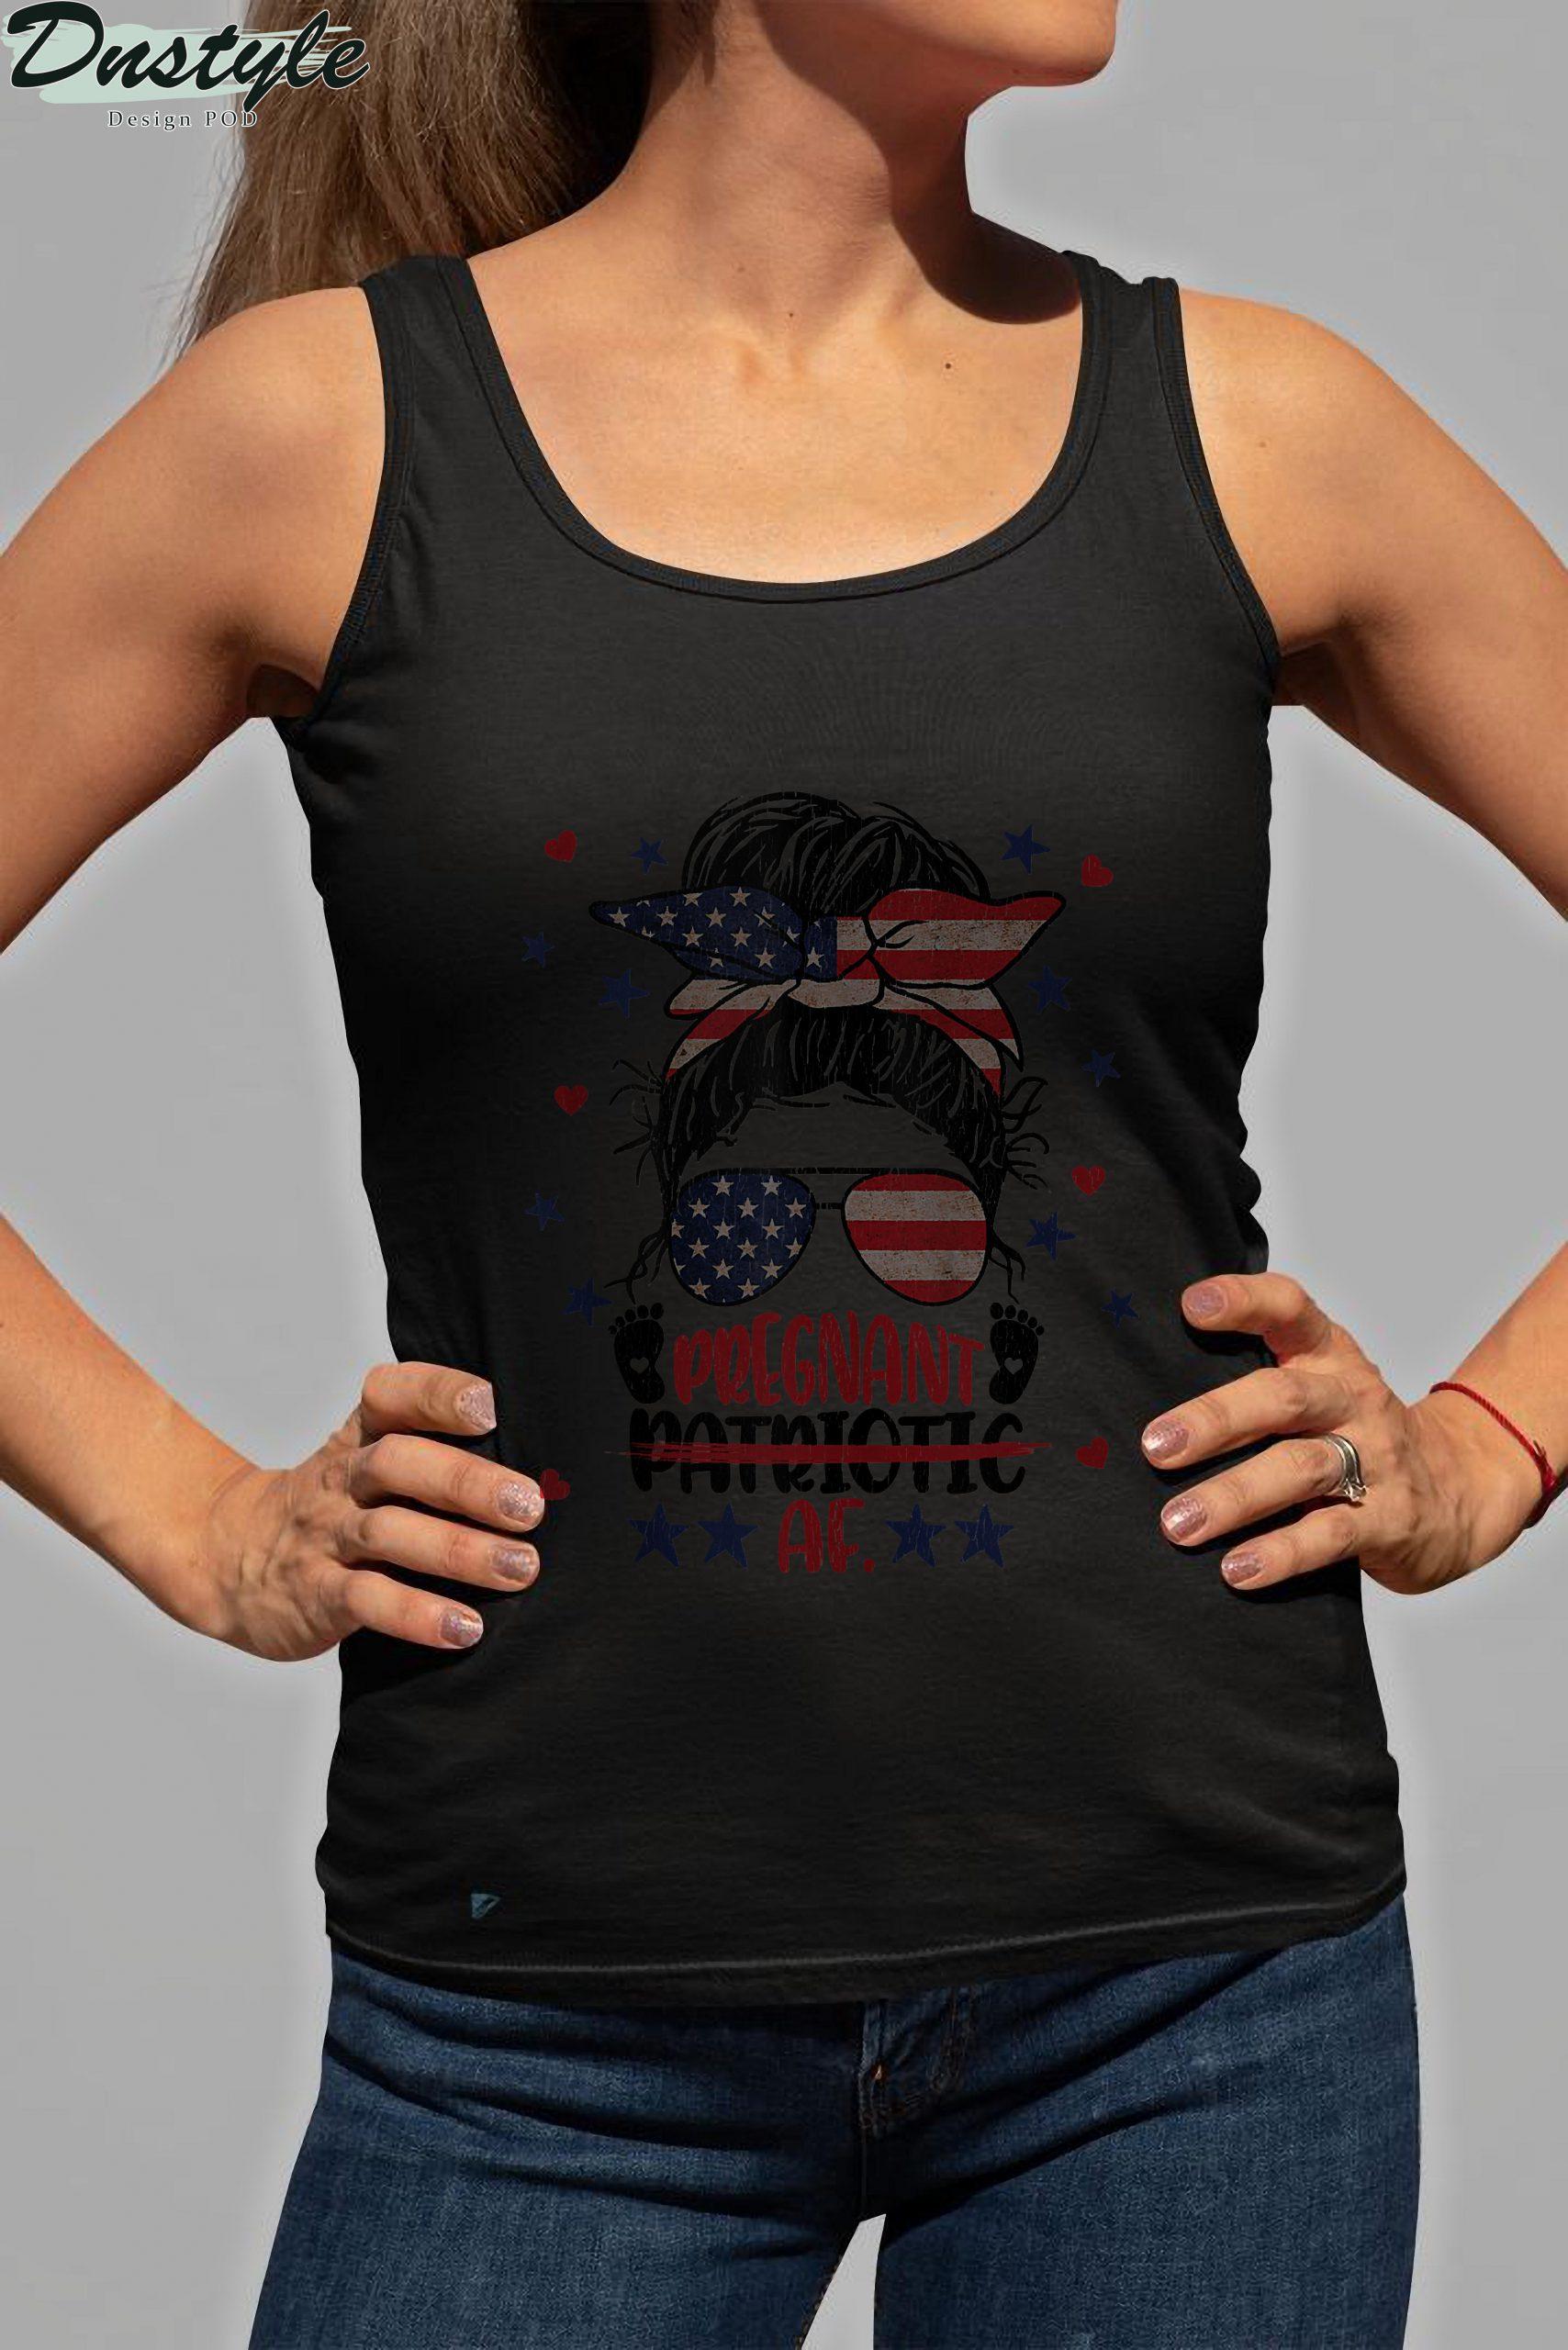 Messy Bun 4th Of July Patriotic Af Pregnant Pregnancy Funny Tank Top 3